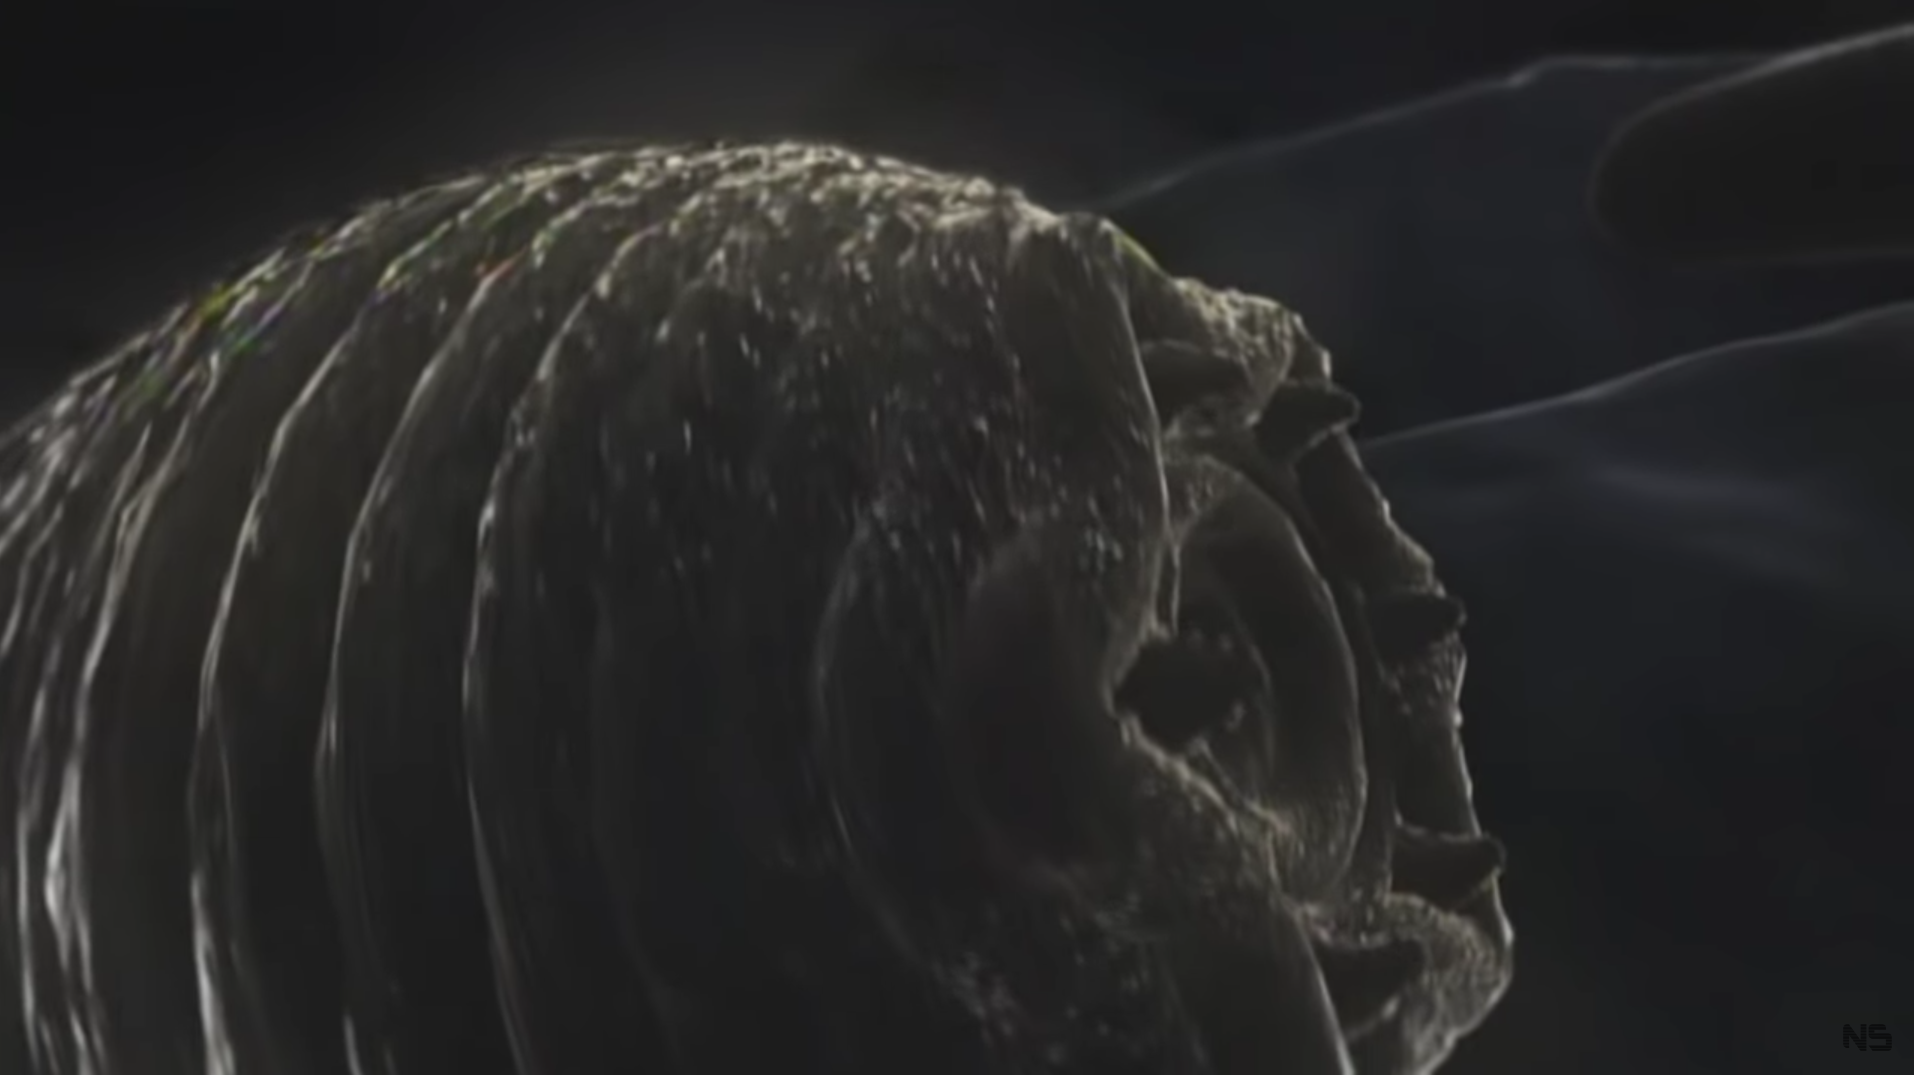 Halicephalobus mephisto (дьявольский червь). Скриншот видео © Naked Science